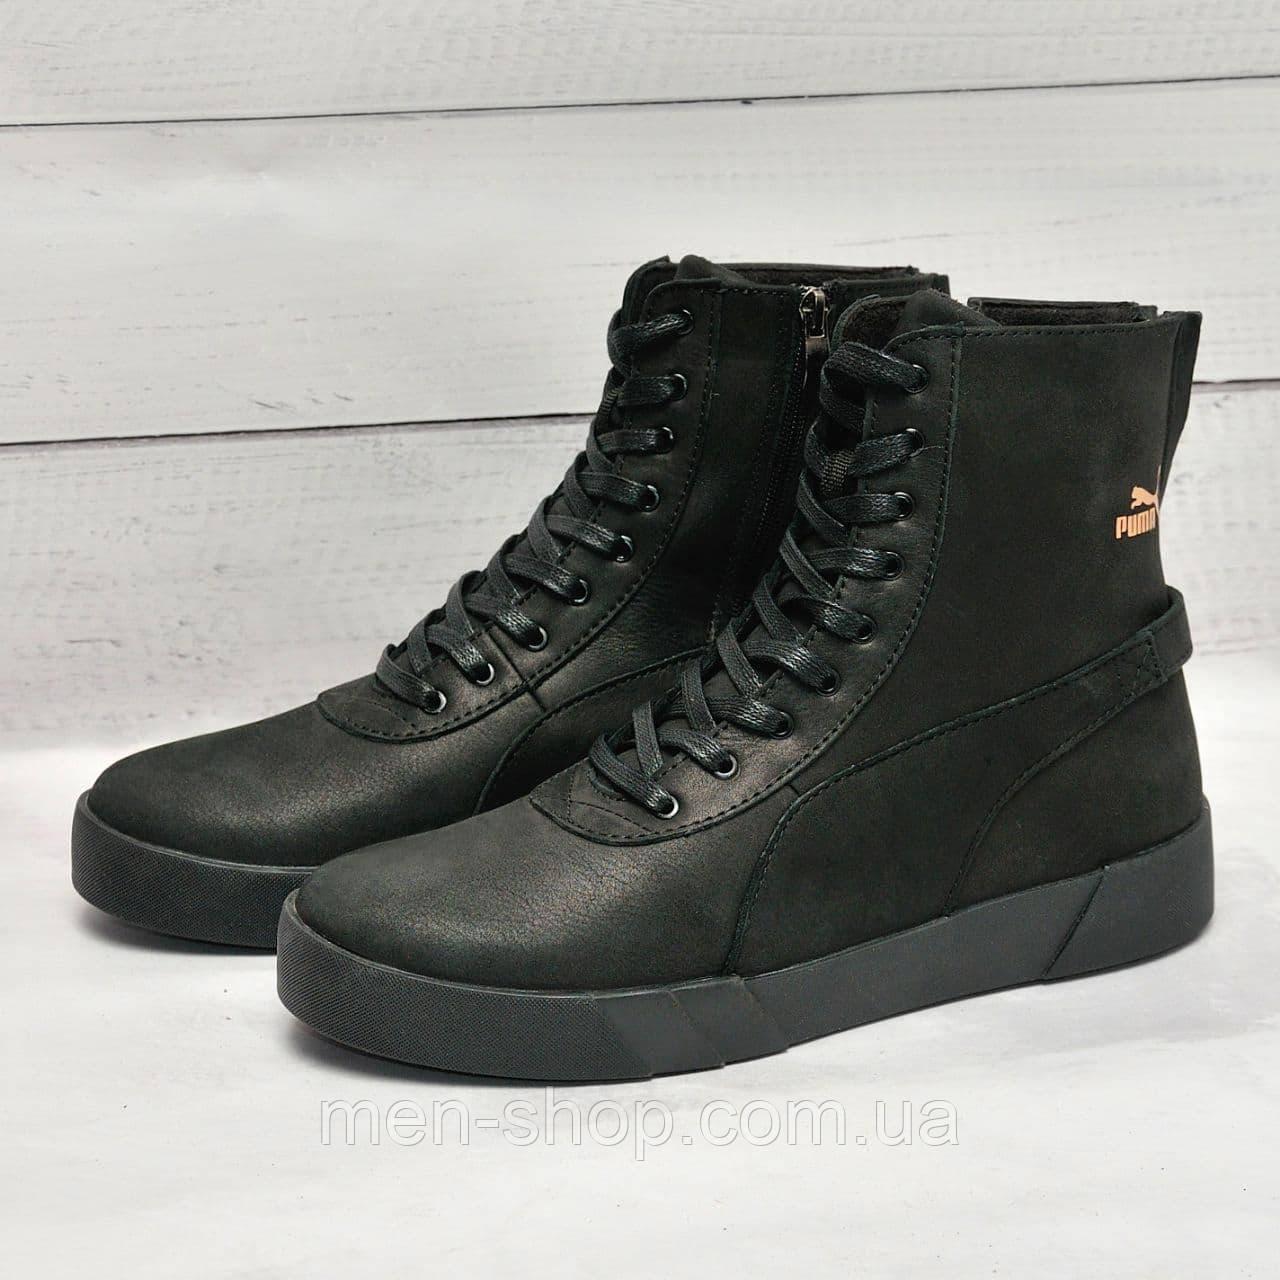 Мужские ботинки с мехом в стиле Puma